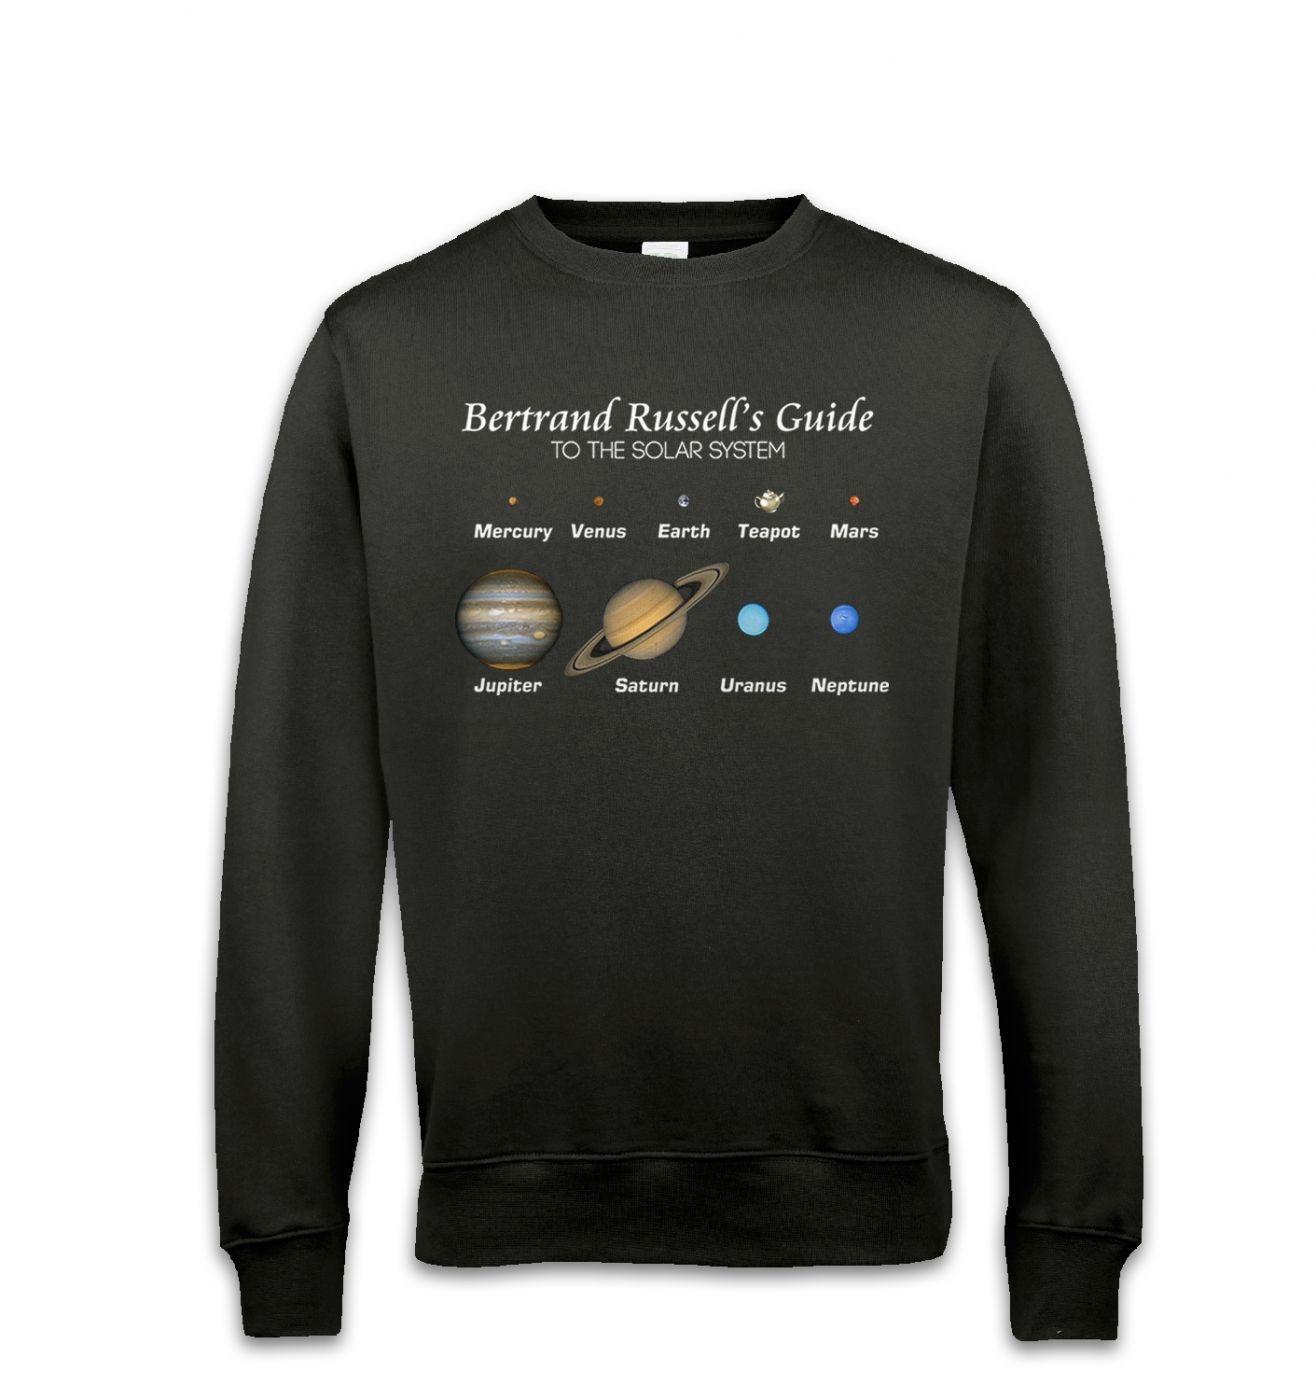 Bertrand Russell's Guide sweatshirt